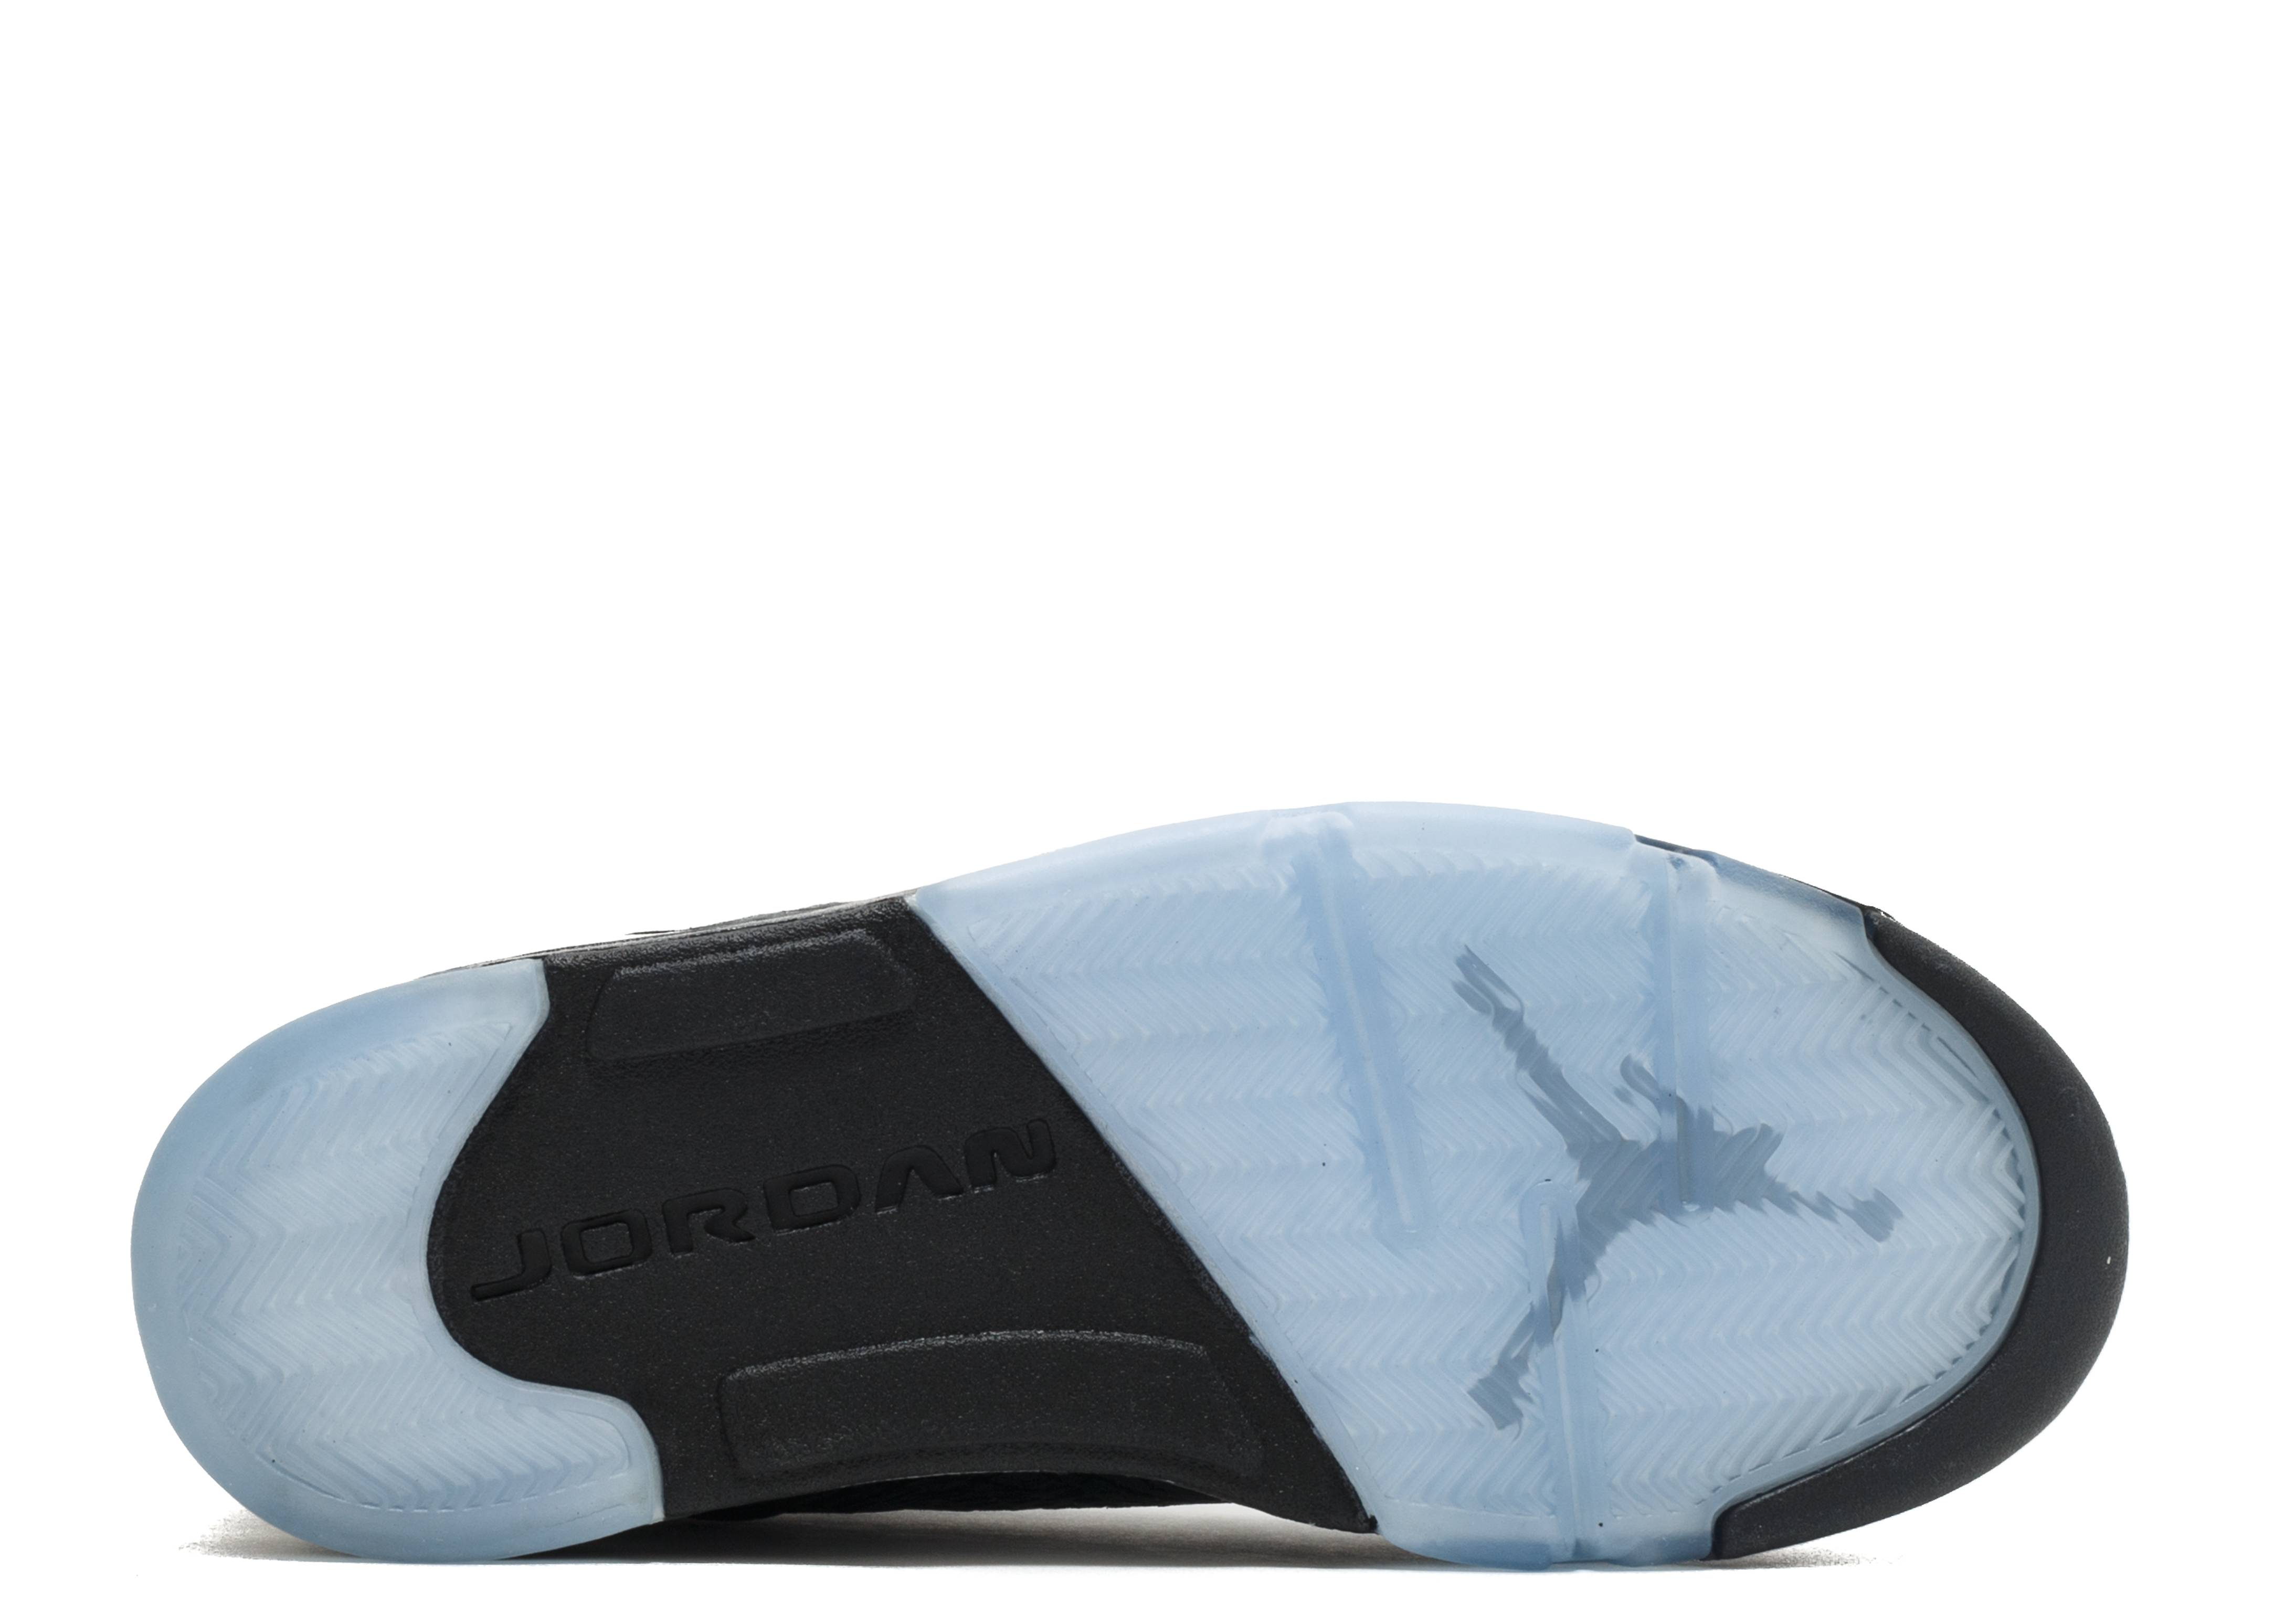 sale retailer f21be 63f2e Air Jordan 5 Retro 3lab5